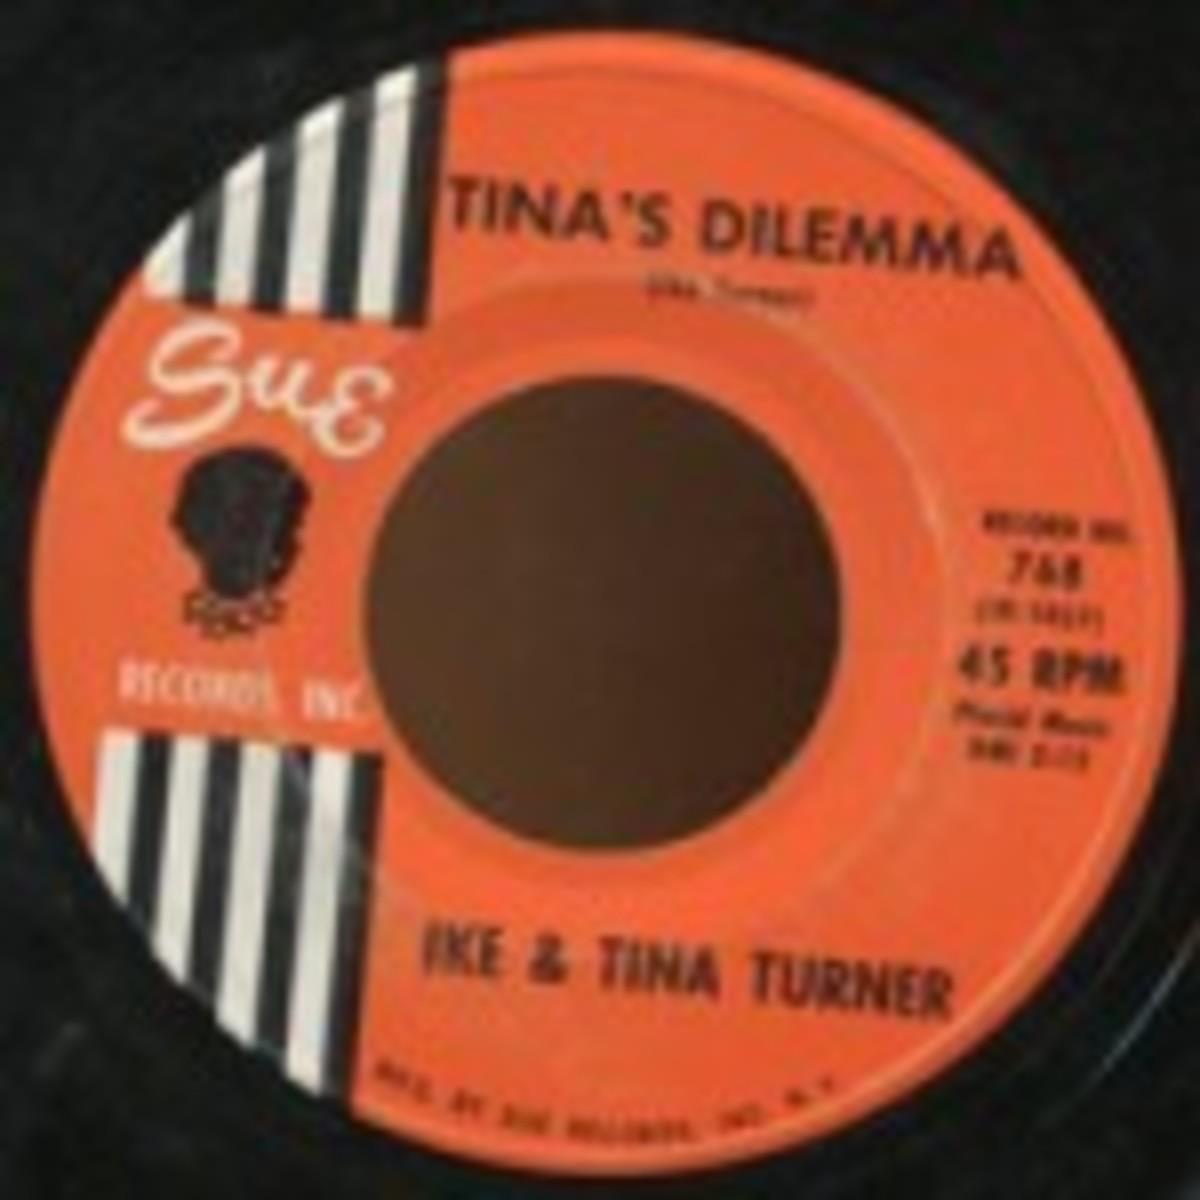 Ik and Tina Turner Sue 768